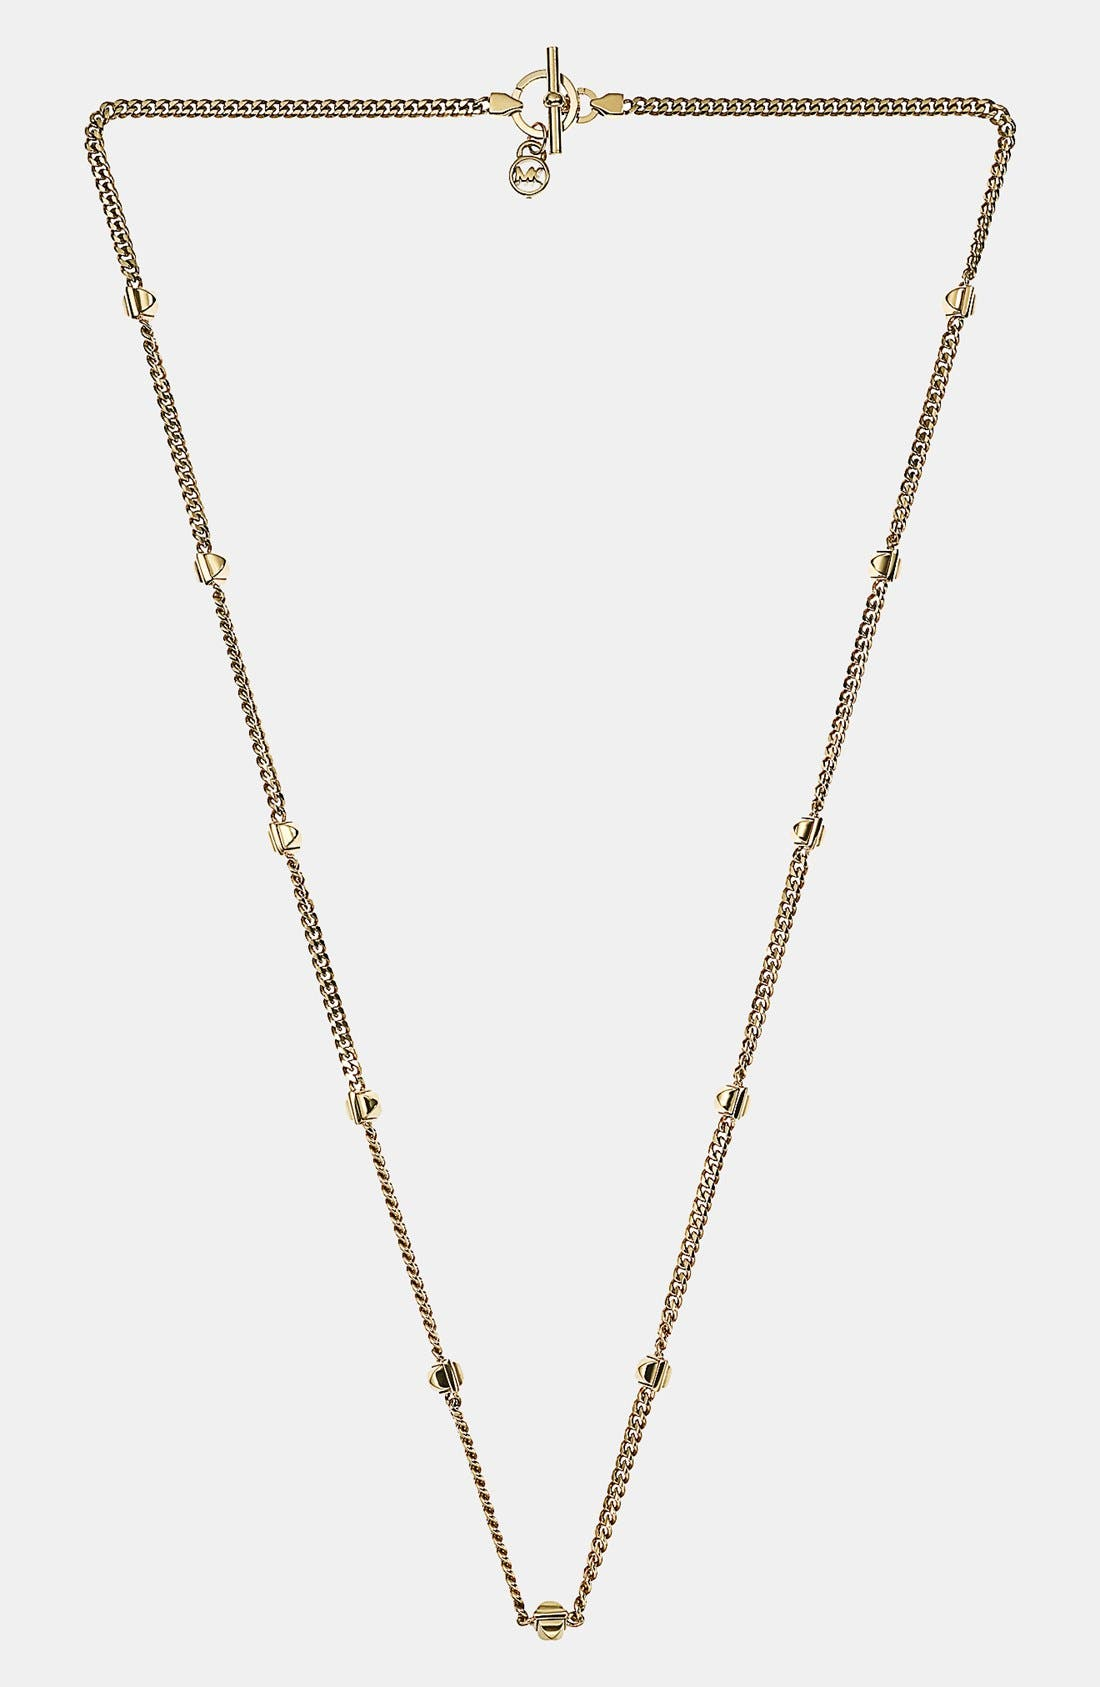 Main Image - Michael Kors 'Glam Rock' Long Station Necklace